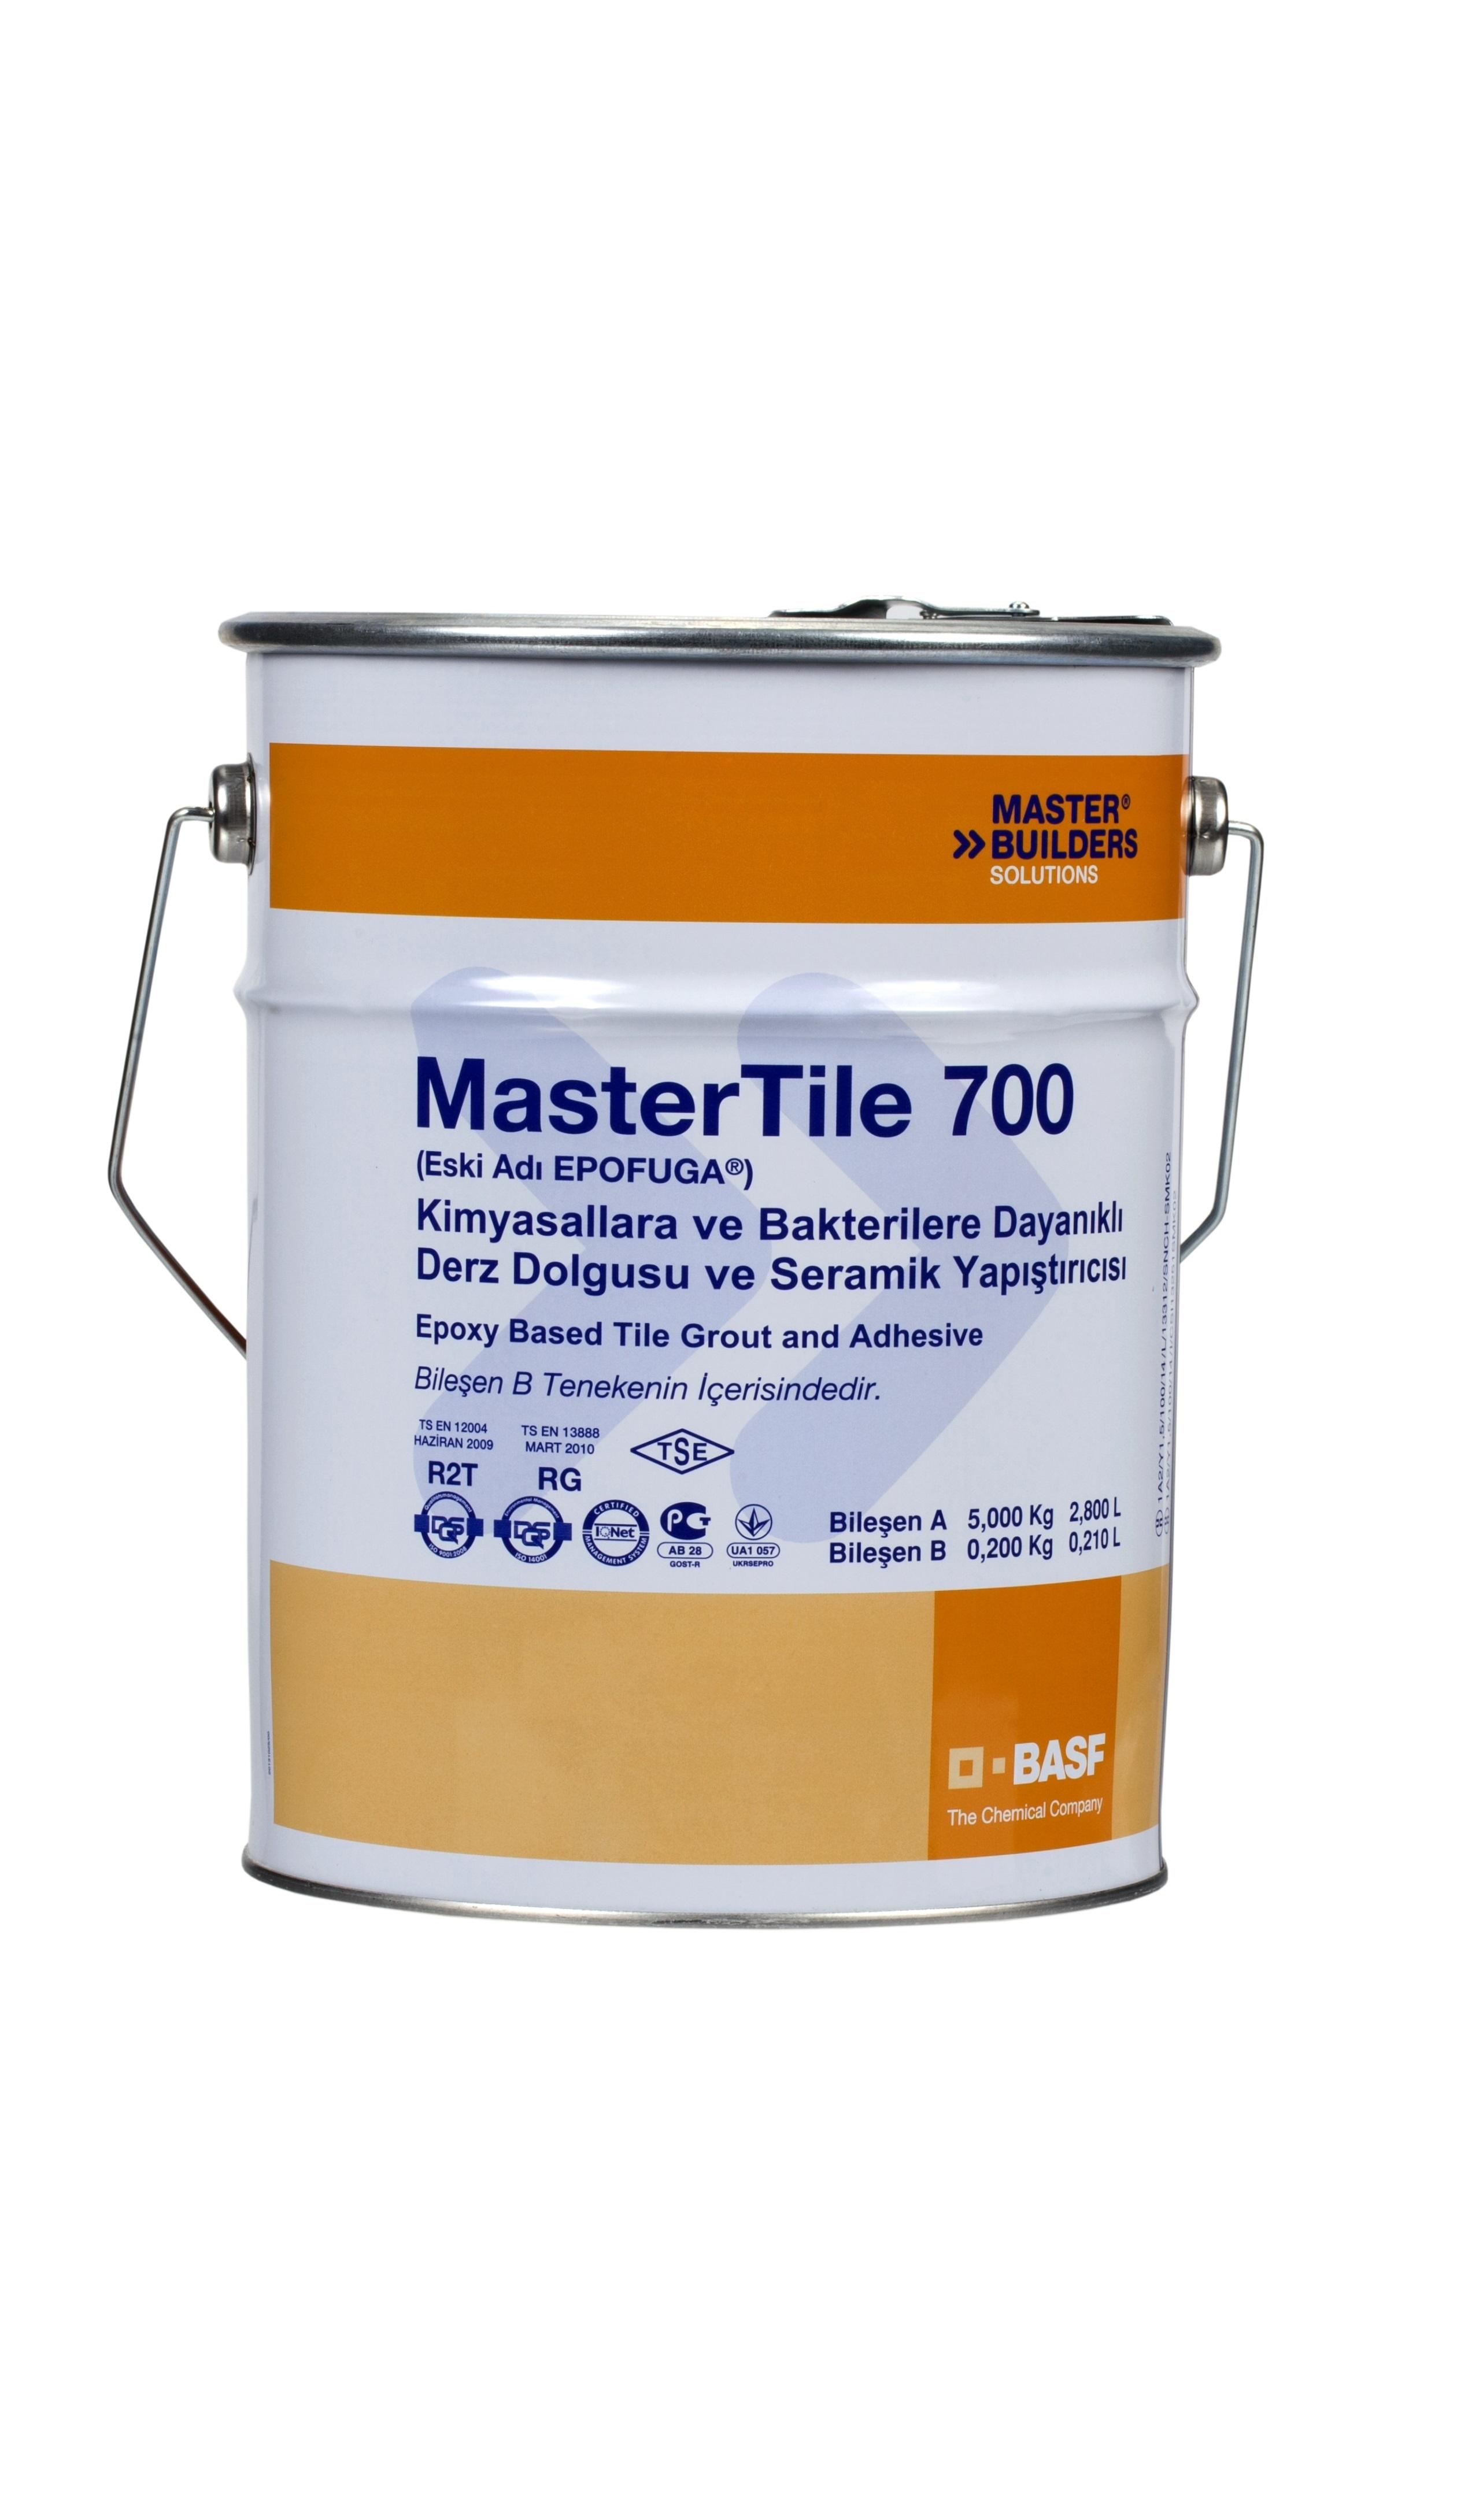 BASF Mastertile 700 Derz Dolgu Gri 5,2kg